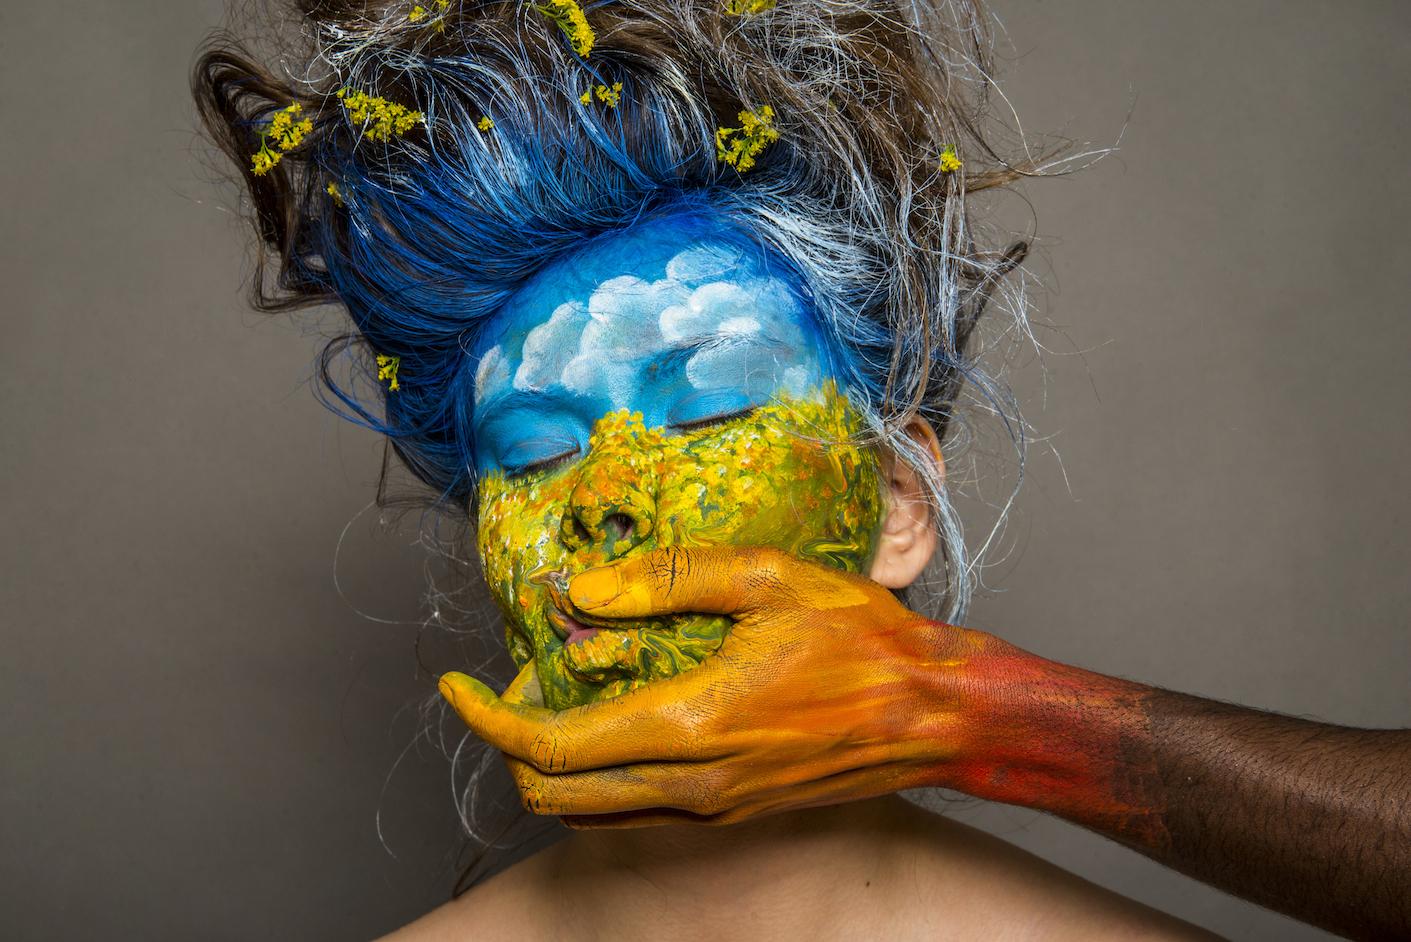 alin pescina the artist community